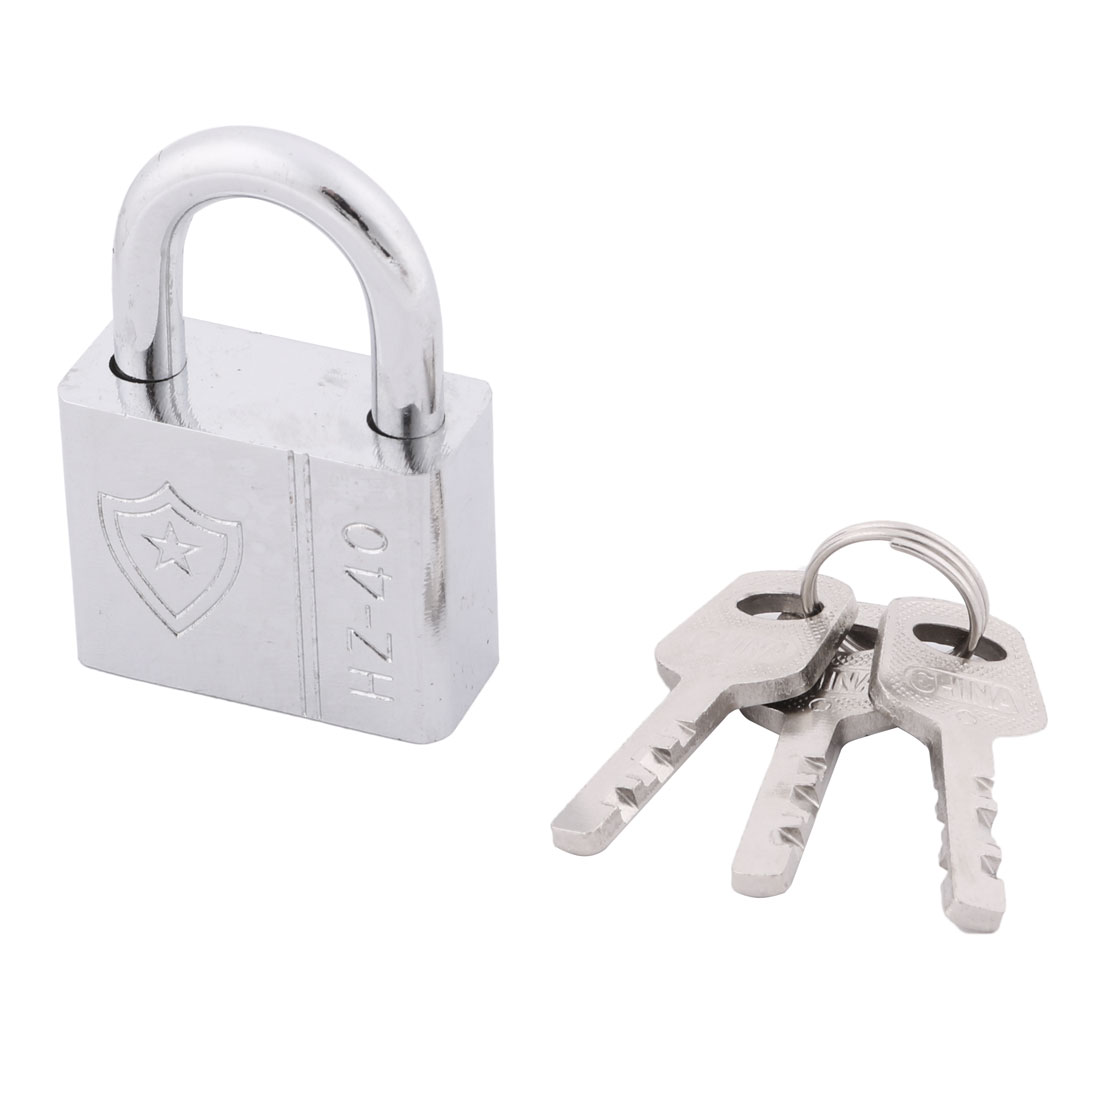 Door Metal Rectangle Security Shackle Padlock Hardware Silver Tone 40mm Width - image 3 of 3